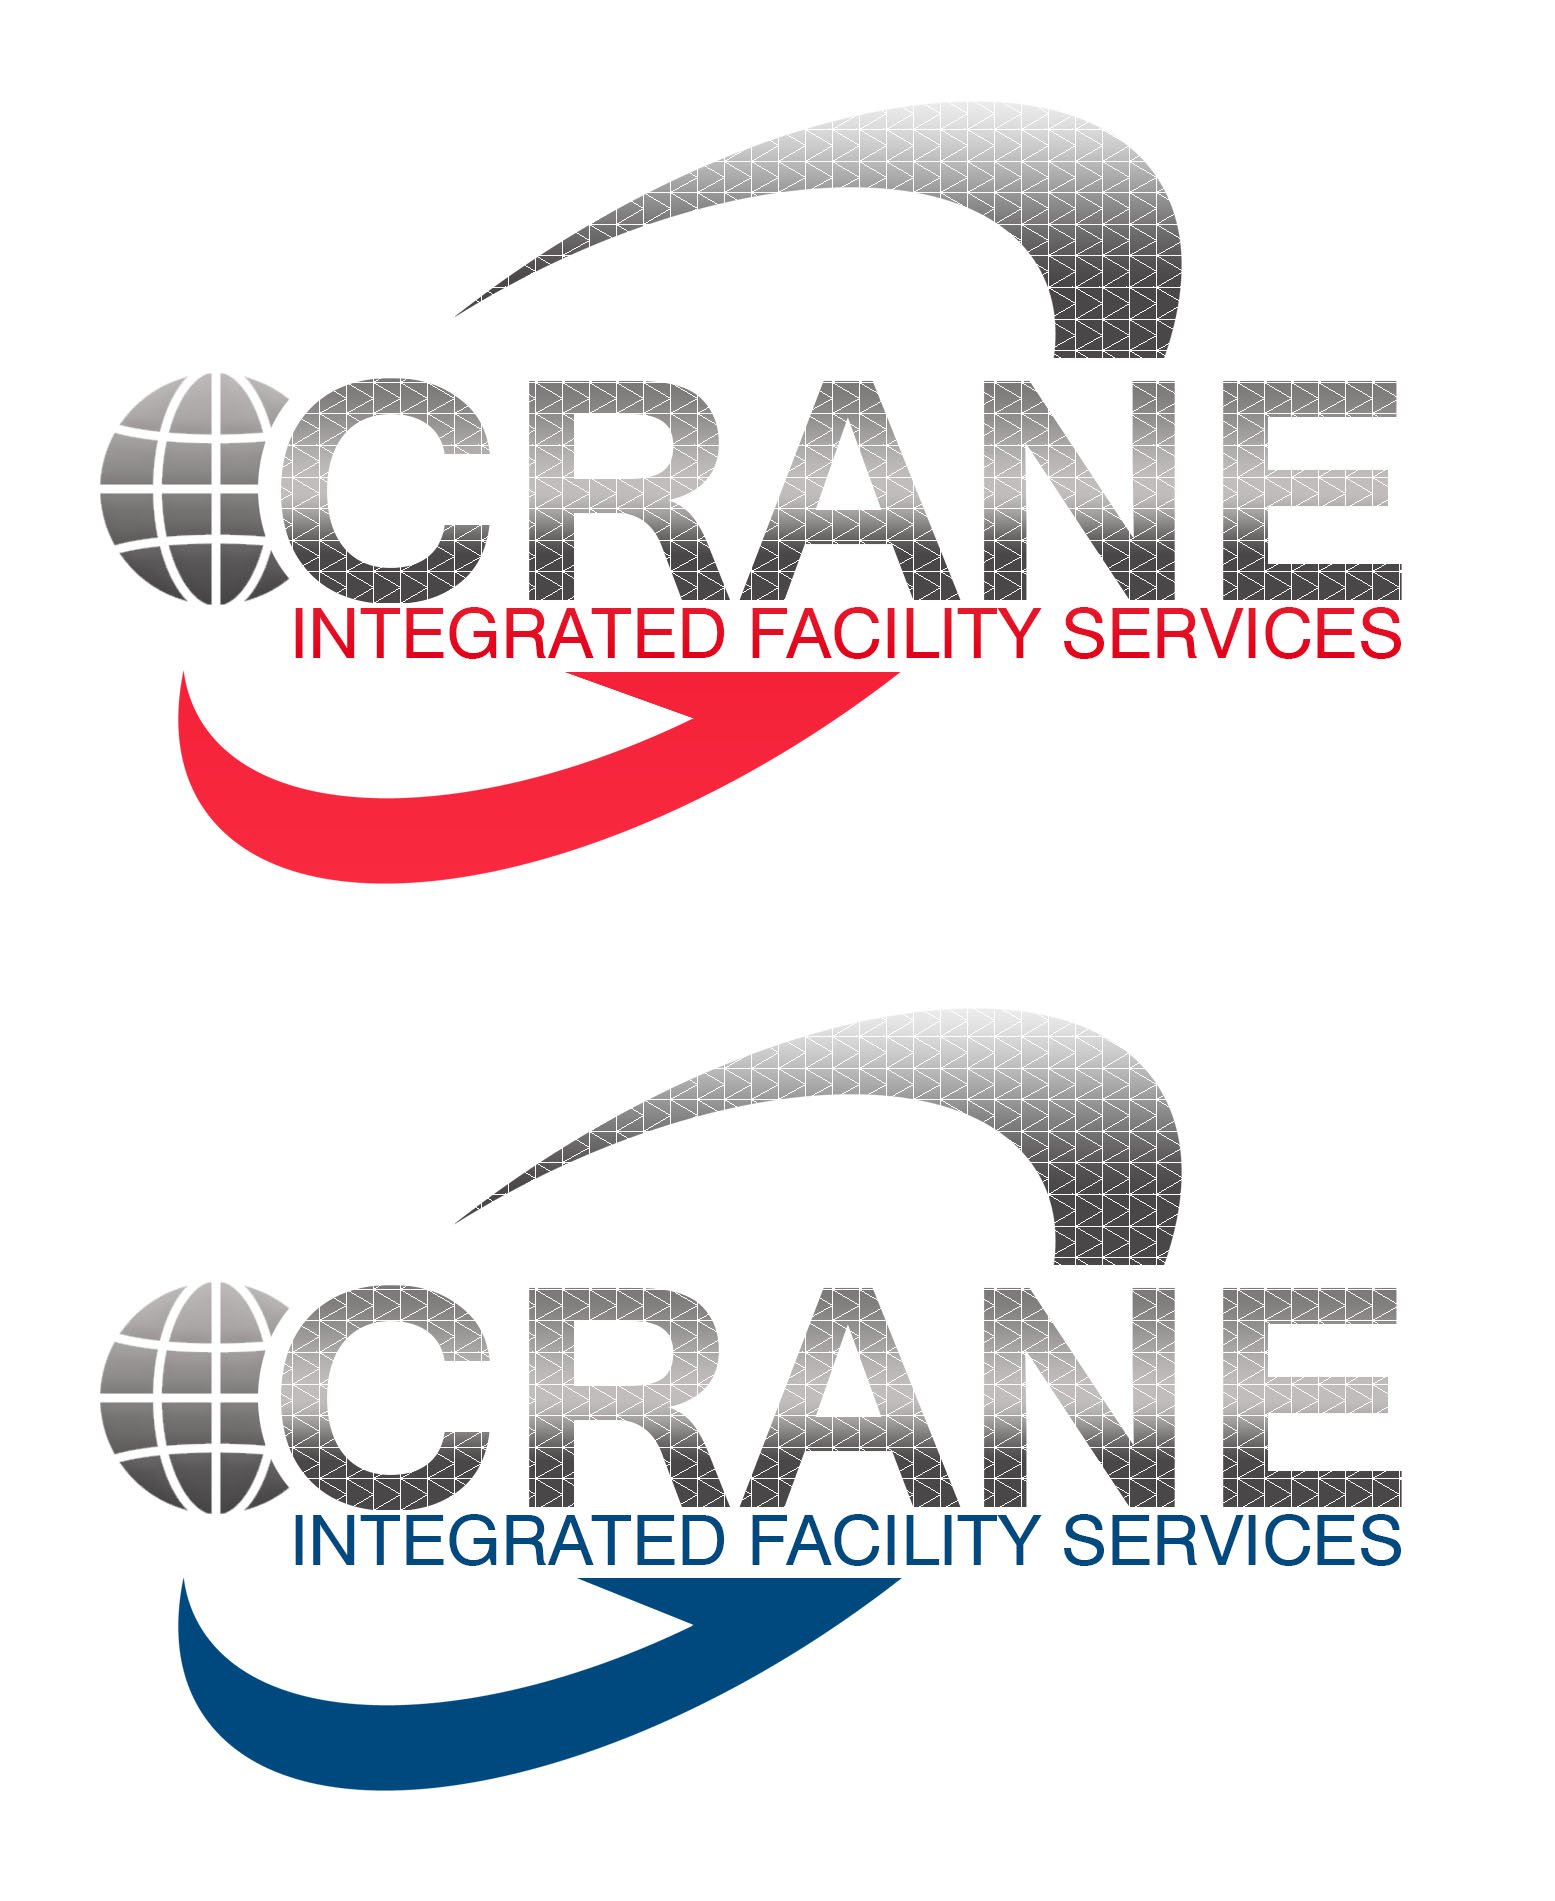 Logo Design by JSDESIGNGROUP - Entry No. 31 in the Logo Design Contest Inspiring Logo Design for Crane Integrated Facility Services.